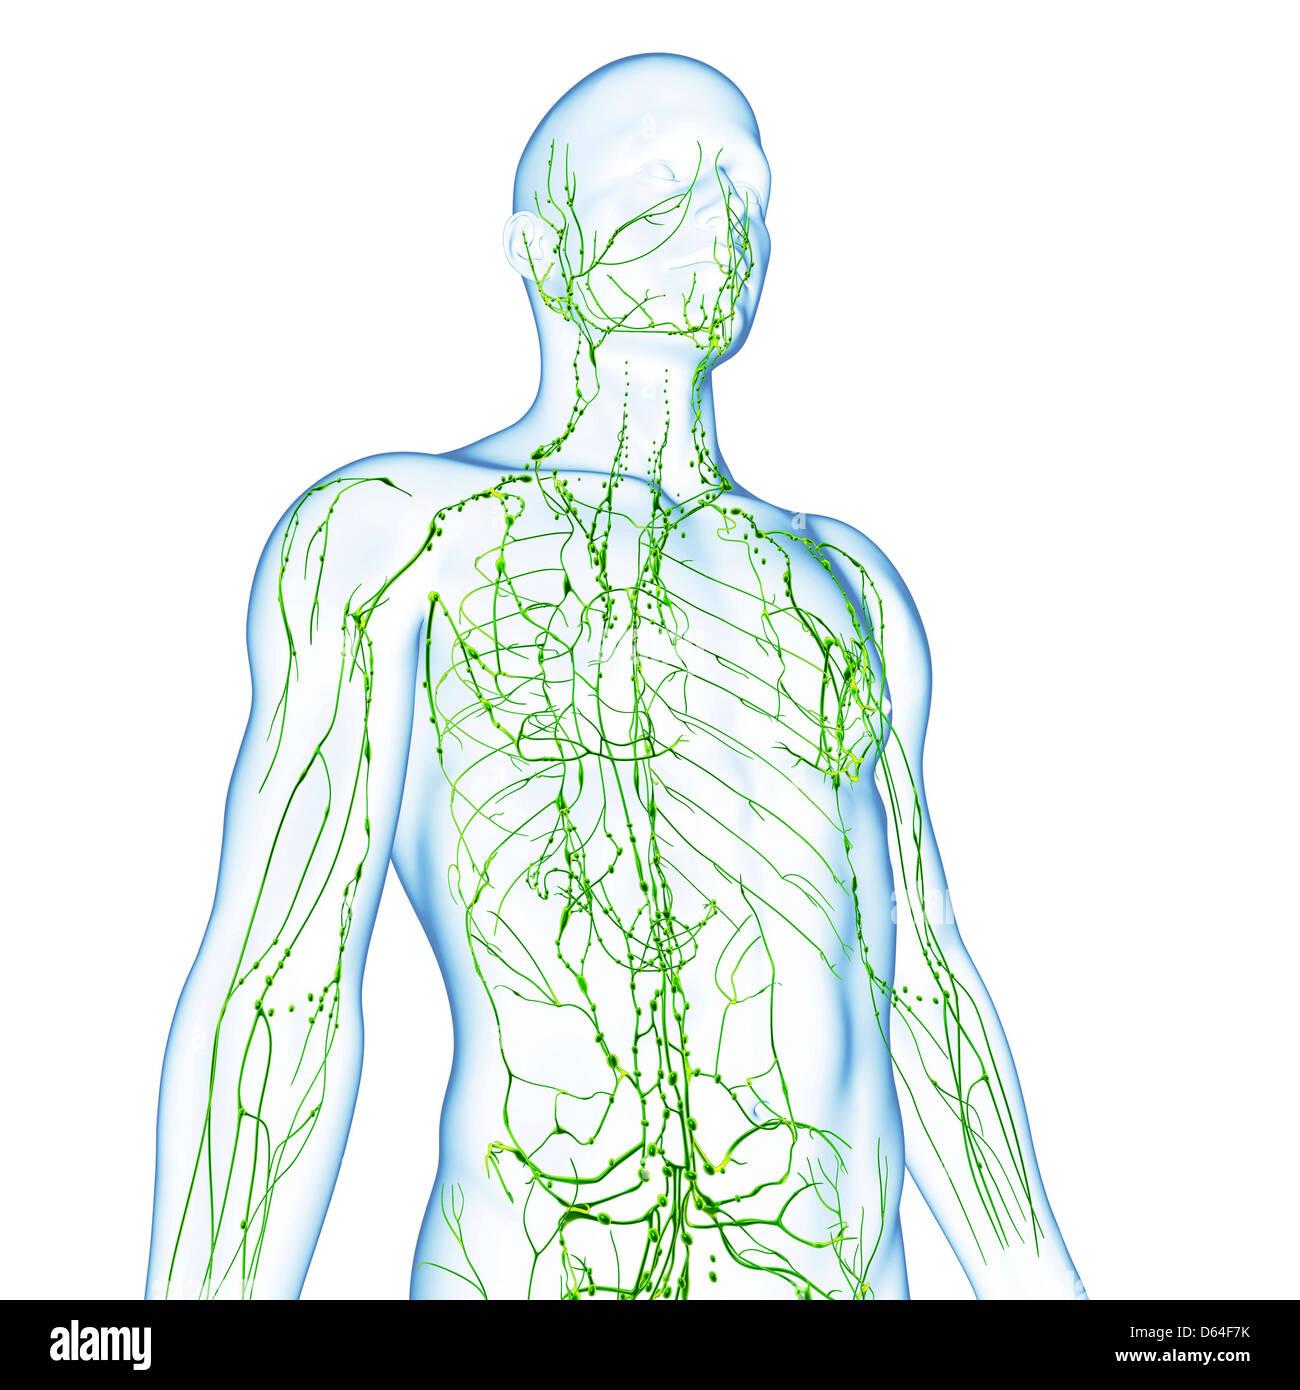 Fantastisch Menschliche Körper Lymphsystem Diagramm Ideen ...